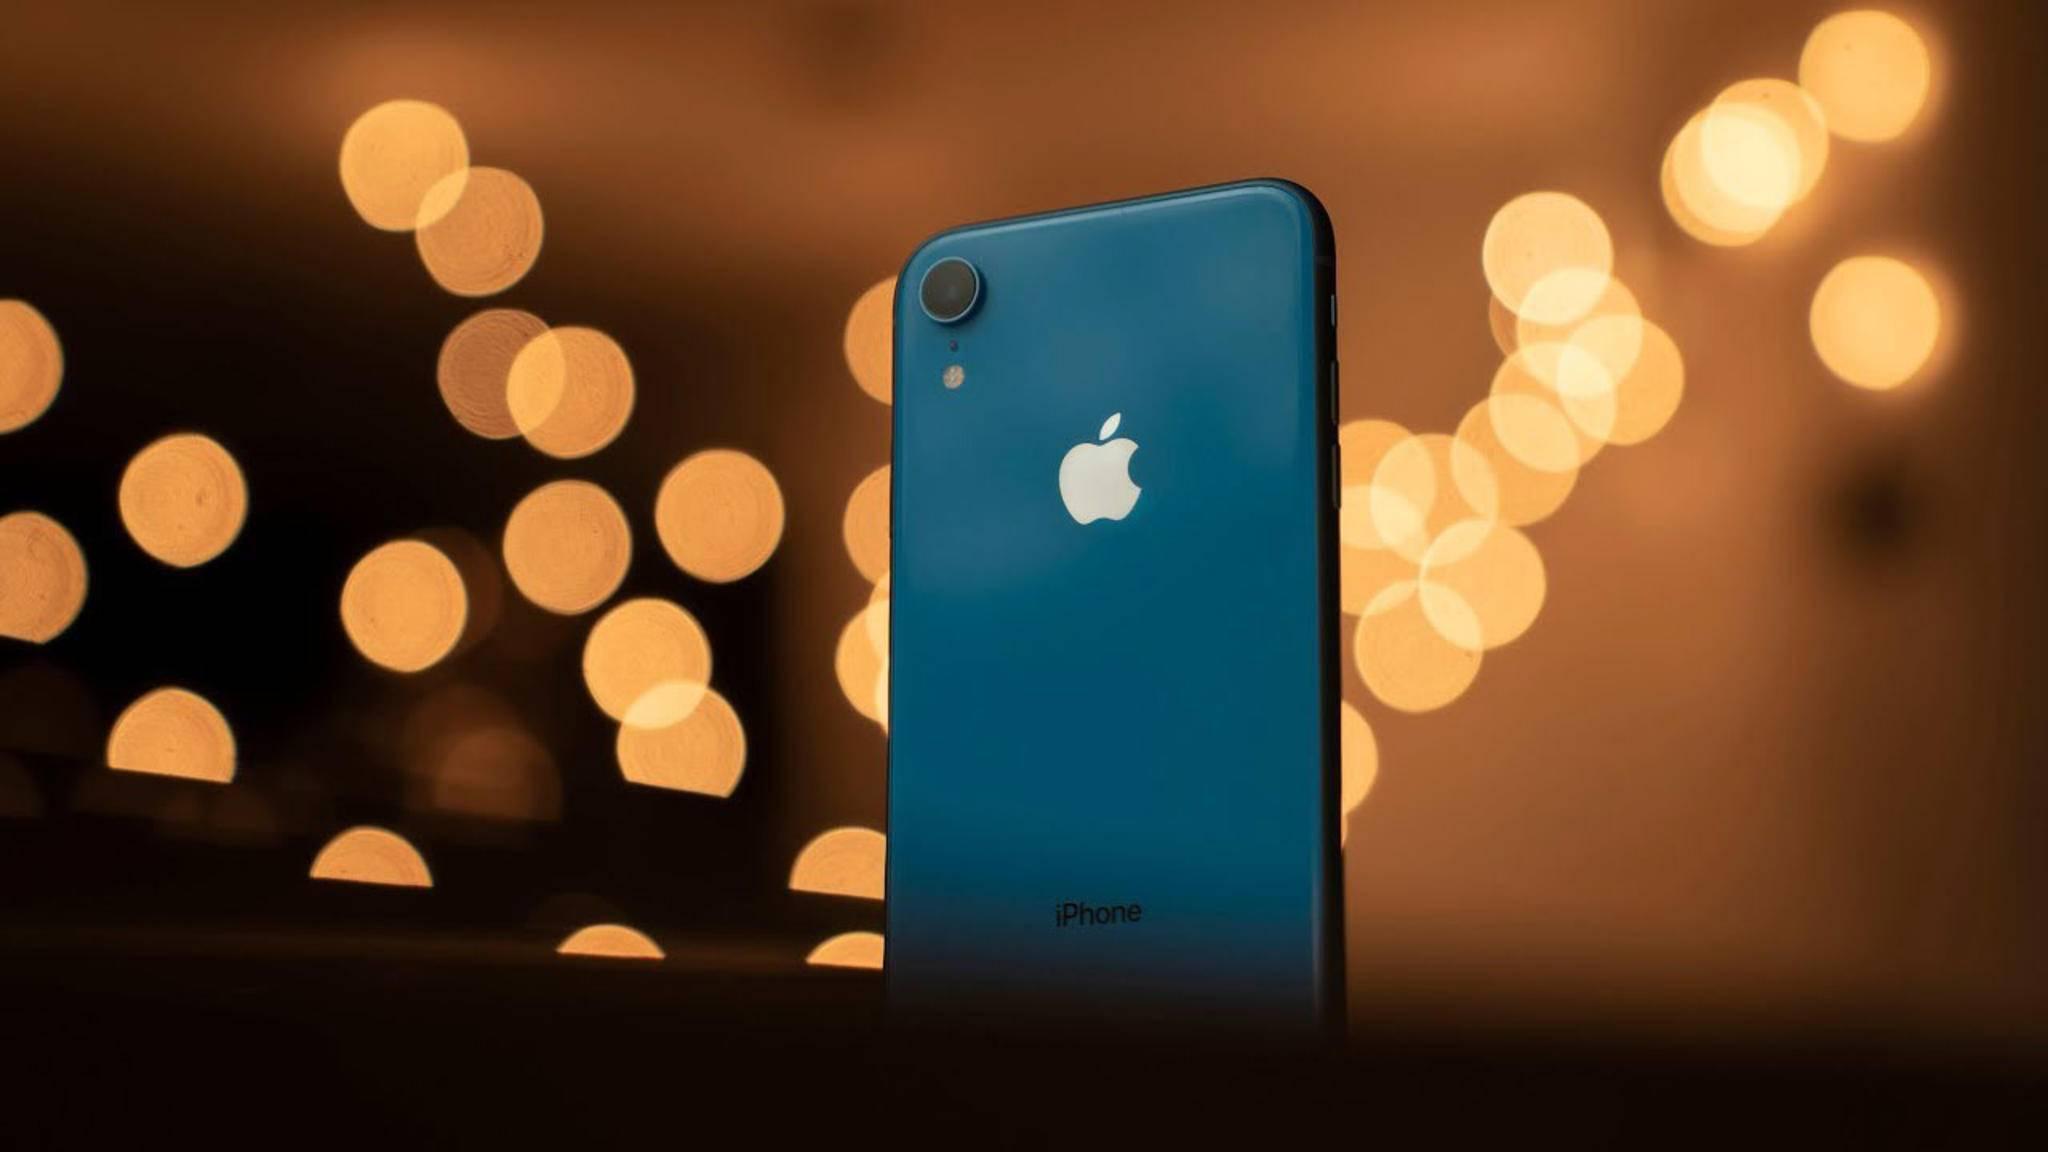 Das iPhone XR bietet laut DxOMark die beste Single-Lens-Kamera.